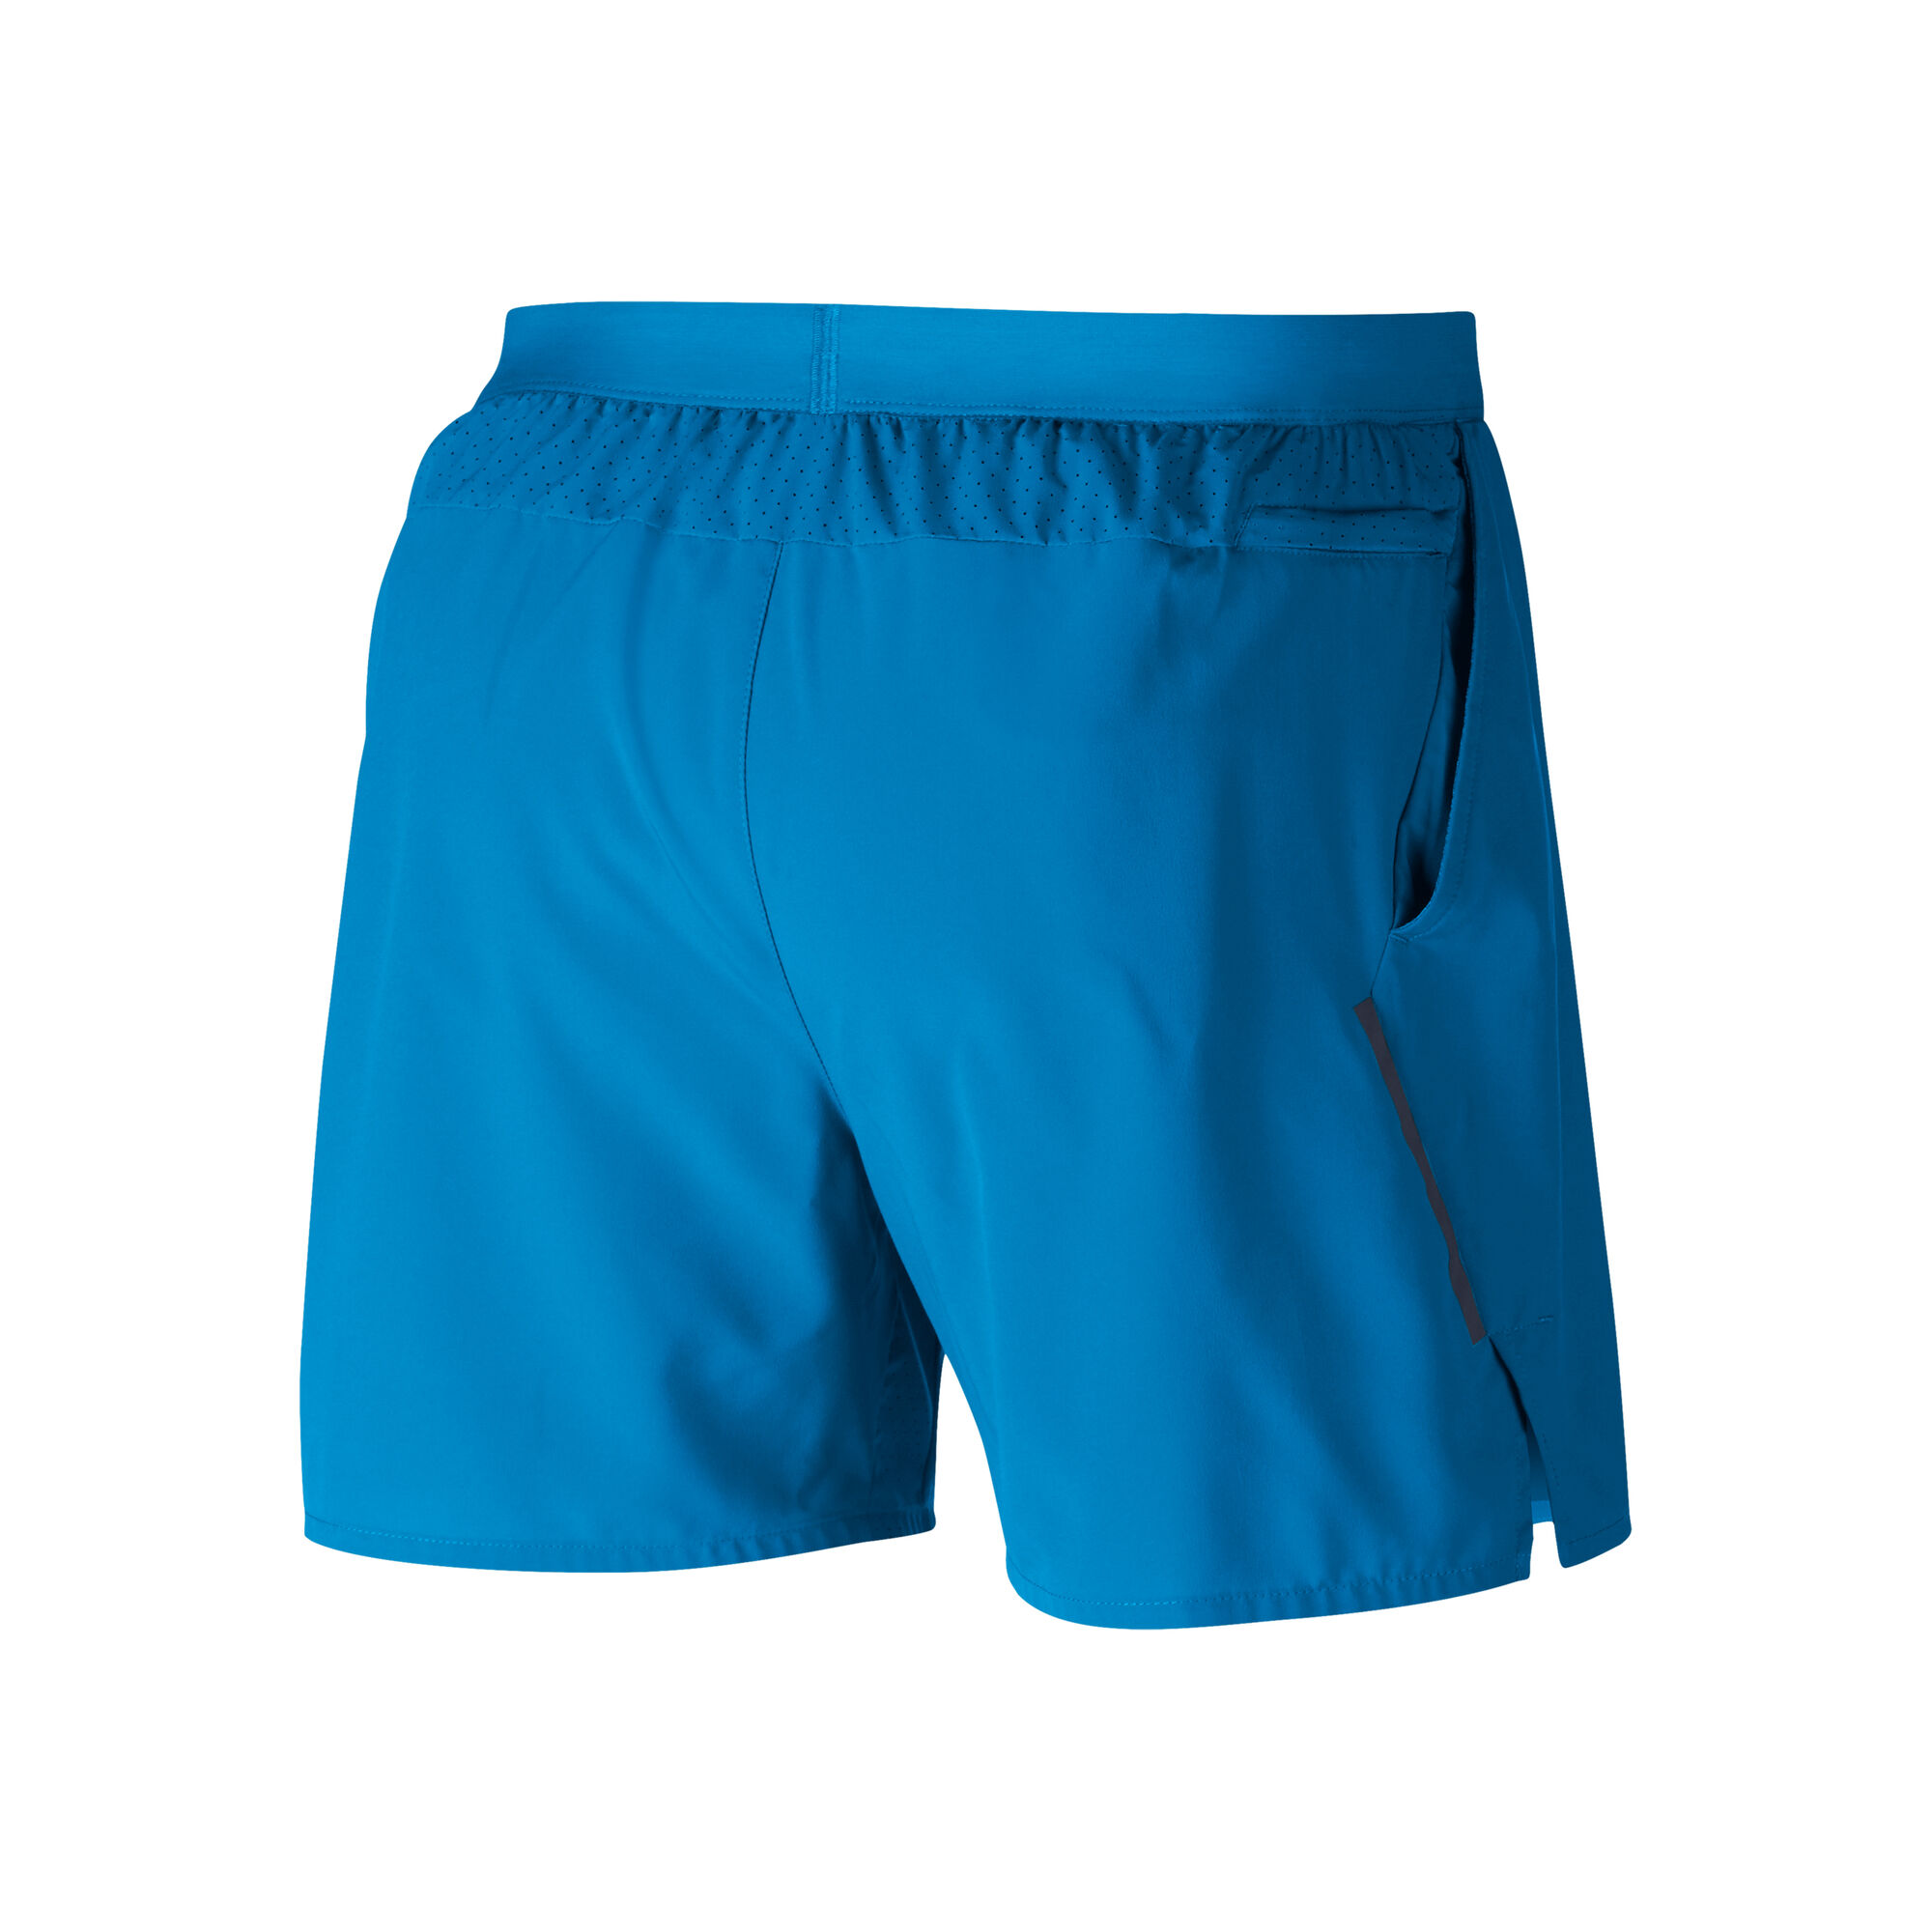 buy Nike Flex Stride Short Elevate TEC Shorts Men - Blue bda25e4f7